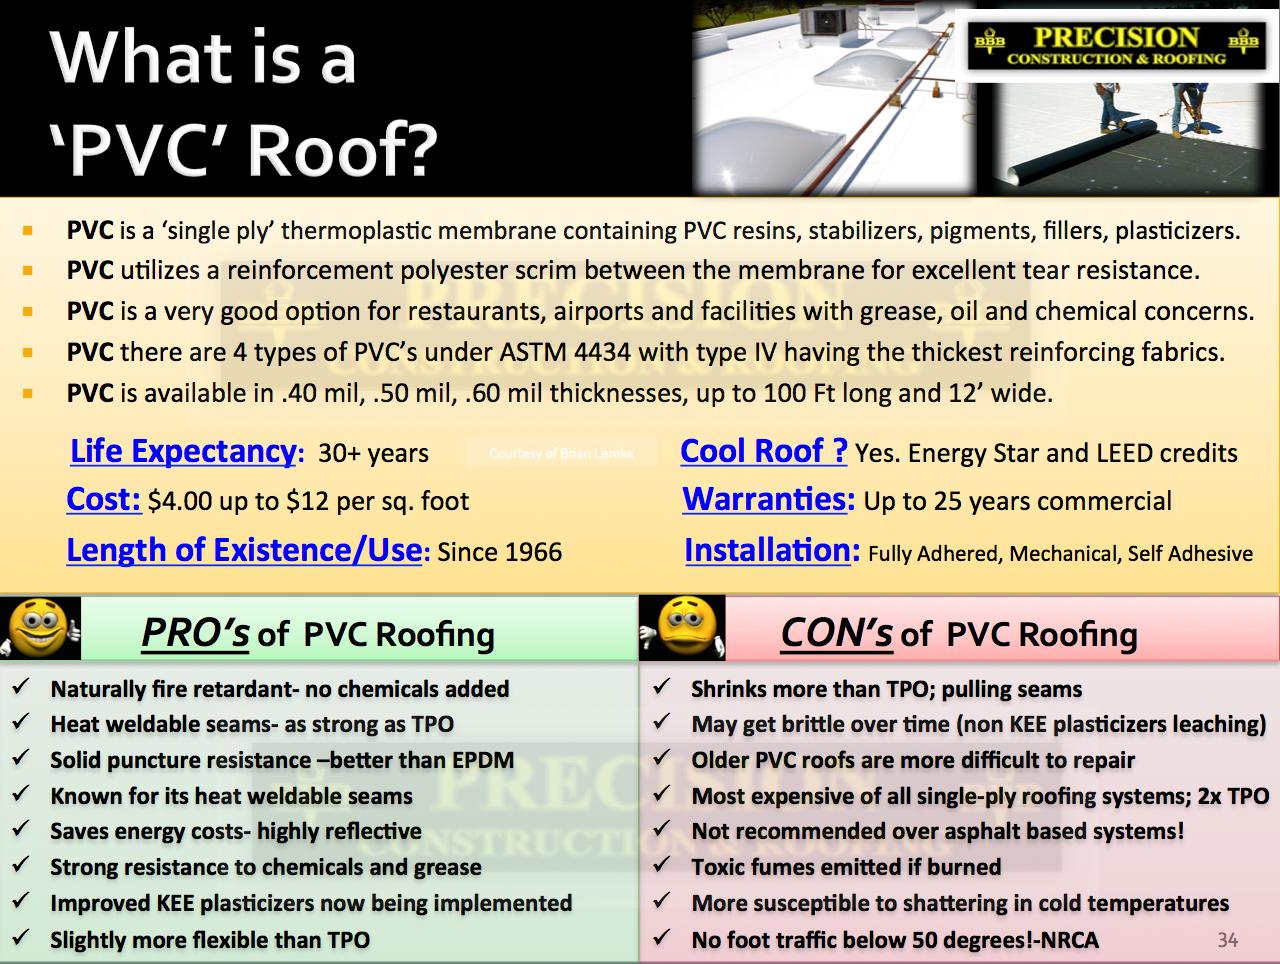 Commercial Roof Tpo Vs Pvc Vs Modified Bitumen Roofing